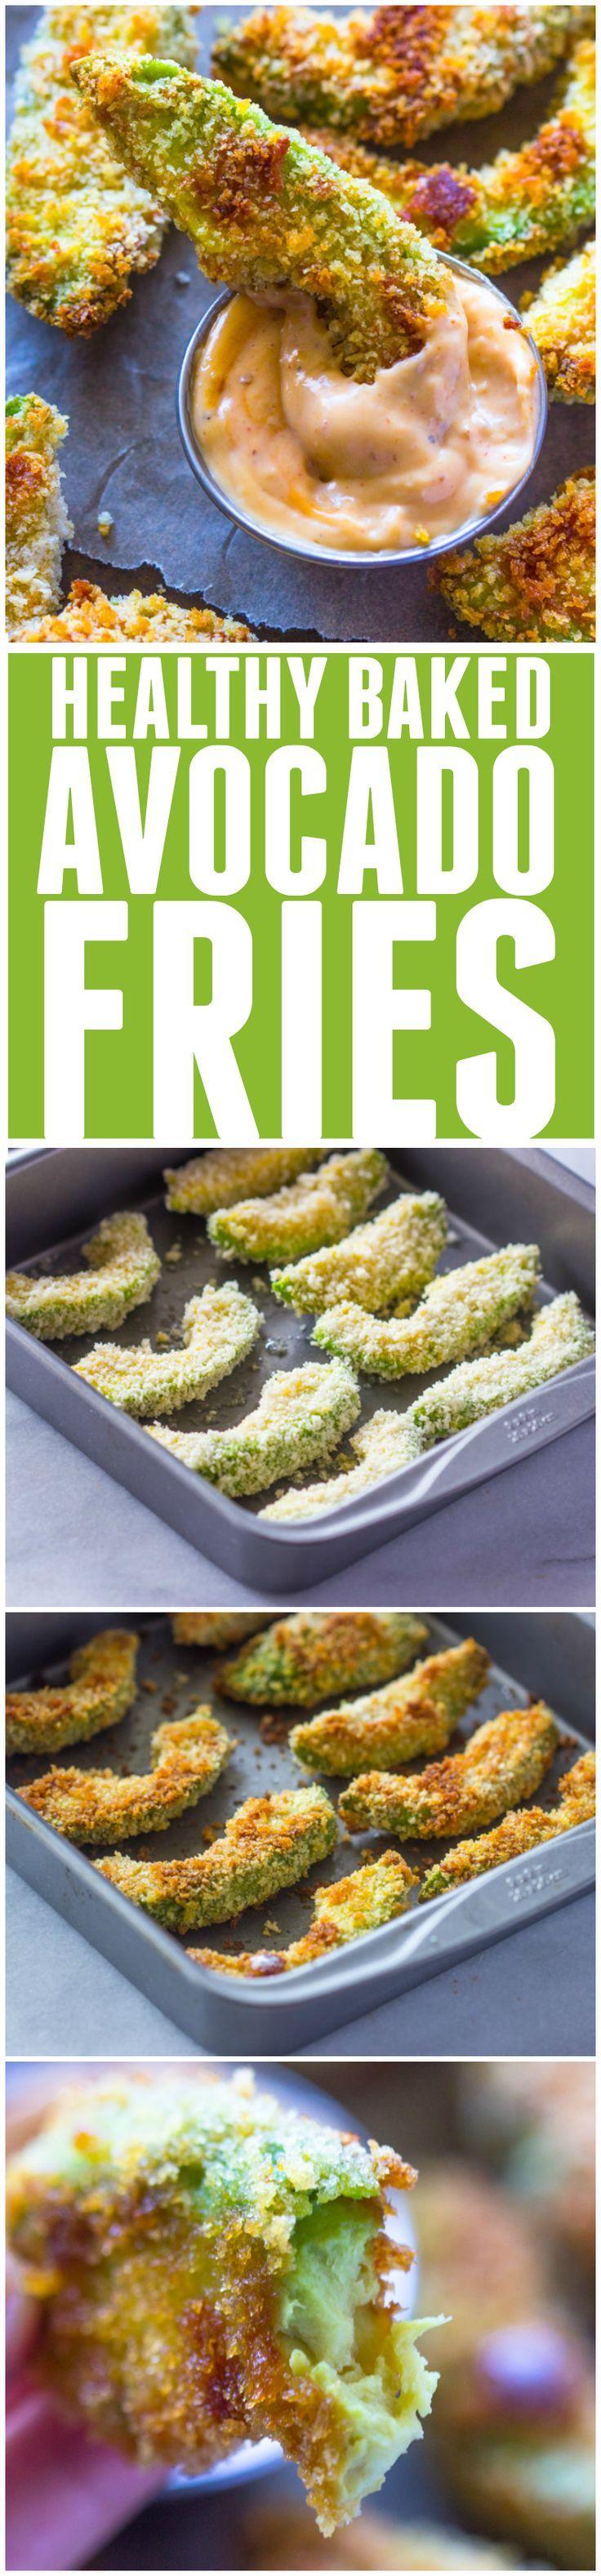 Crispy Baked Avocado Fries & Chipotle Dipping Sauce - ***NOT Paleo or Grain Free http://gimmedelicious.com/2016/01/20/healthy-baked-avocado-fries-chipotle-dipping-sauce/?utm_content=bufferd6058&utm_medium=social&utm_source=pinterest.com&utm_campaign=buffer#comments